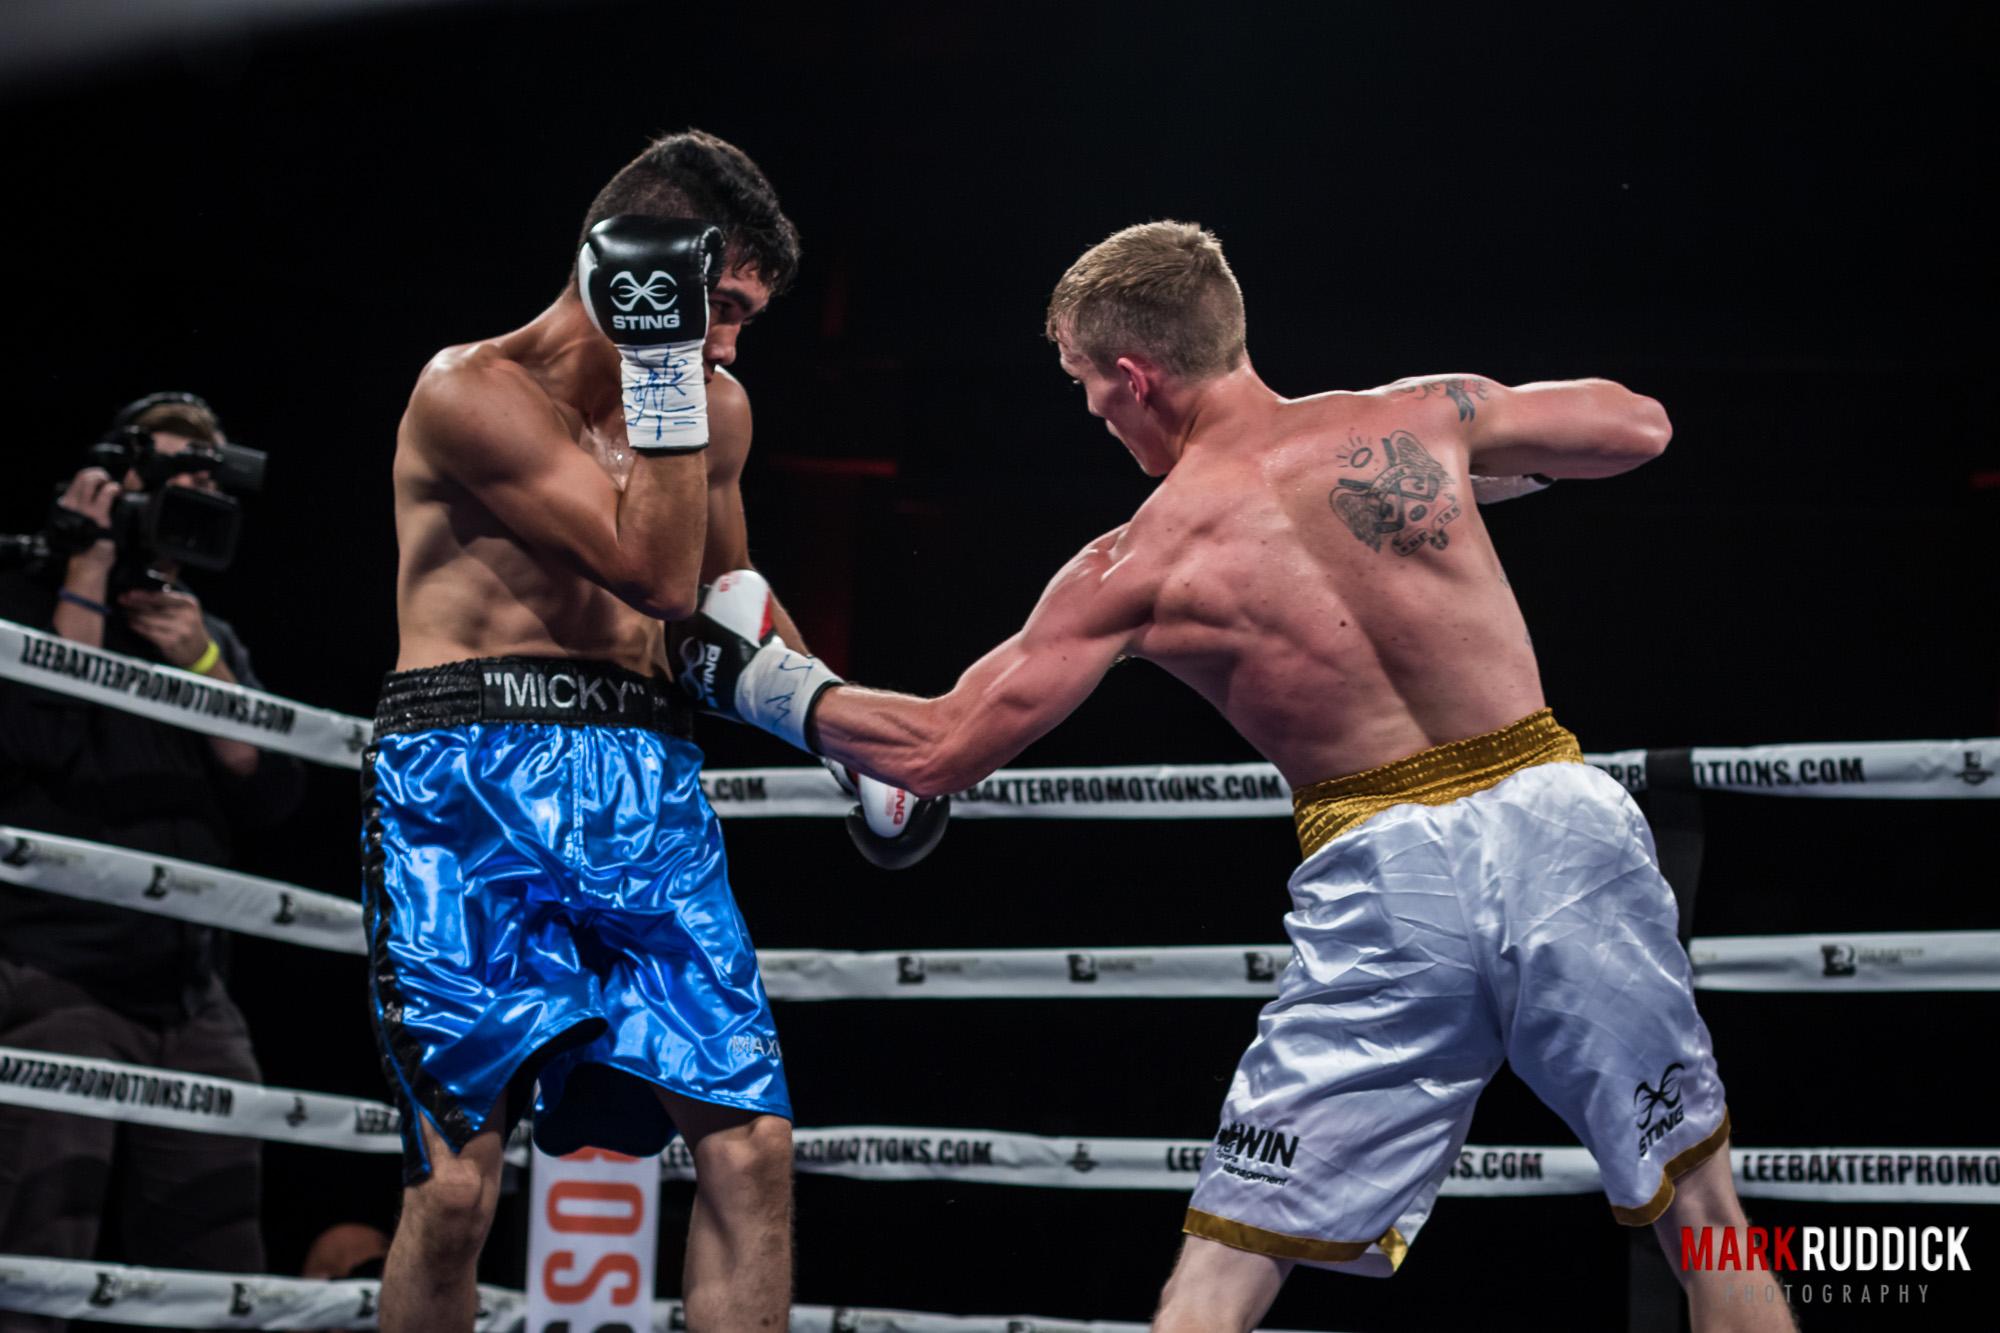 Bout #1 - Bradley Wilcox vs Miguel Angel Cobarrubias